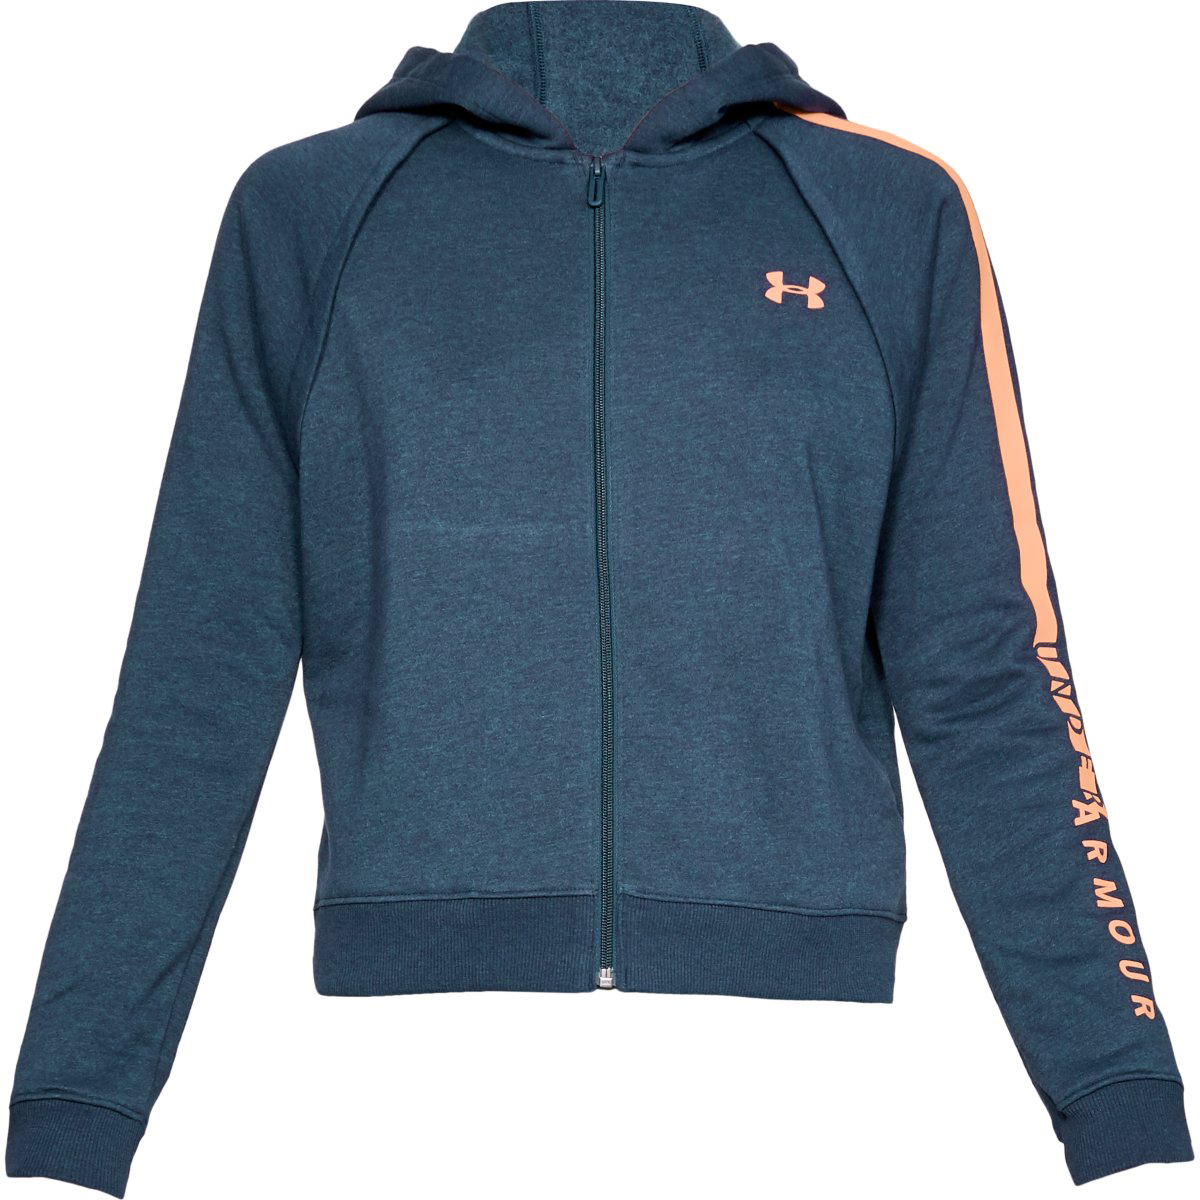 Under Armour Women's Ua Rival Fleece Full-Zip Hoodie - Blue, XL